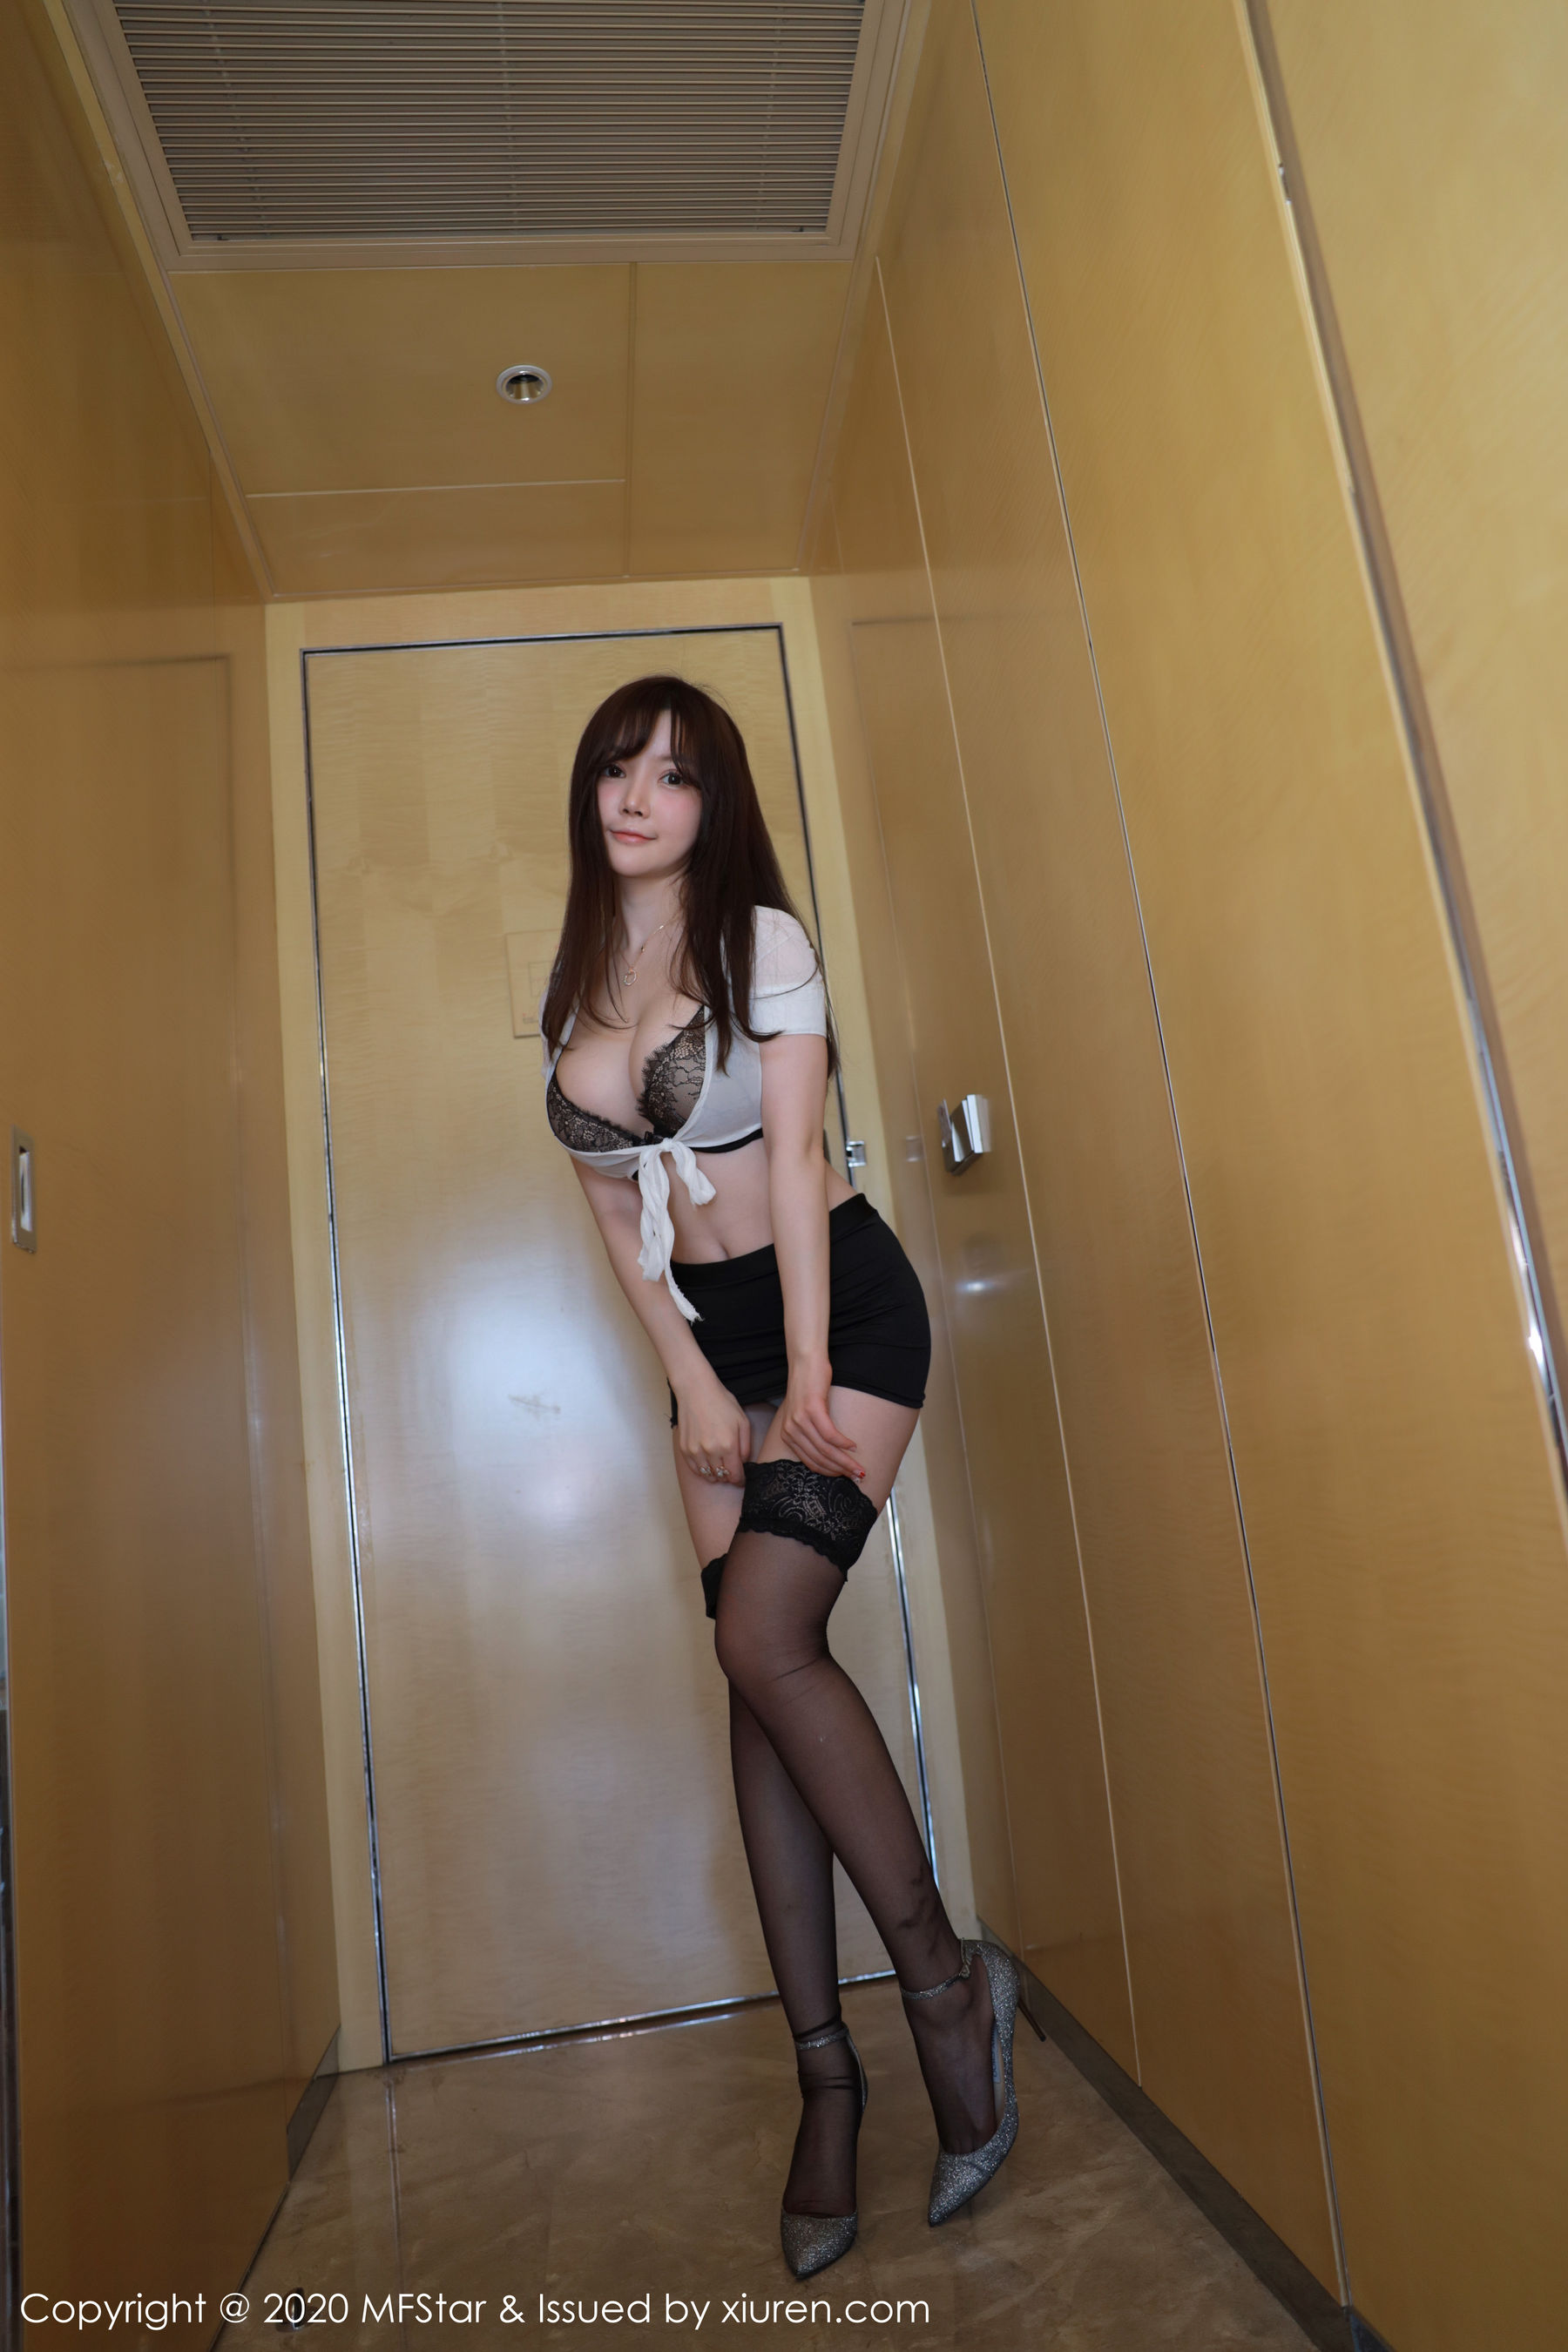 VOL.579 [模范学院]黑丝制服丝袜短裙黑丝诱惑:糯美子MINIbabe(米妮大萌萌,苏糯米,糯美子Mini,米妮mini)超高清写真套图(67P)